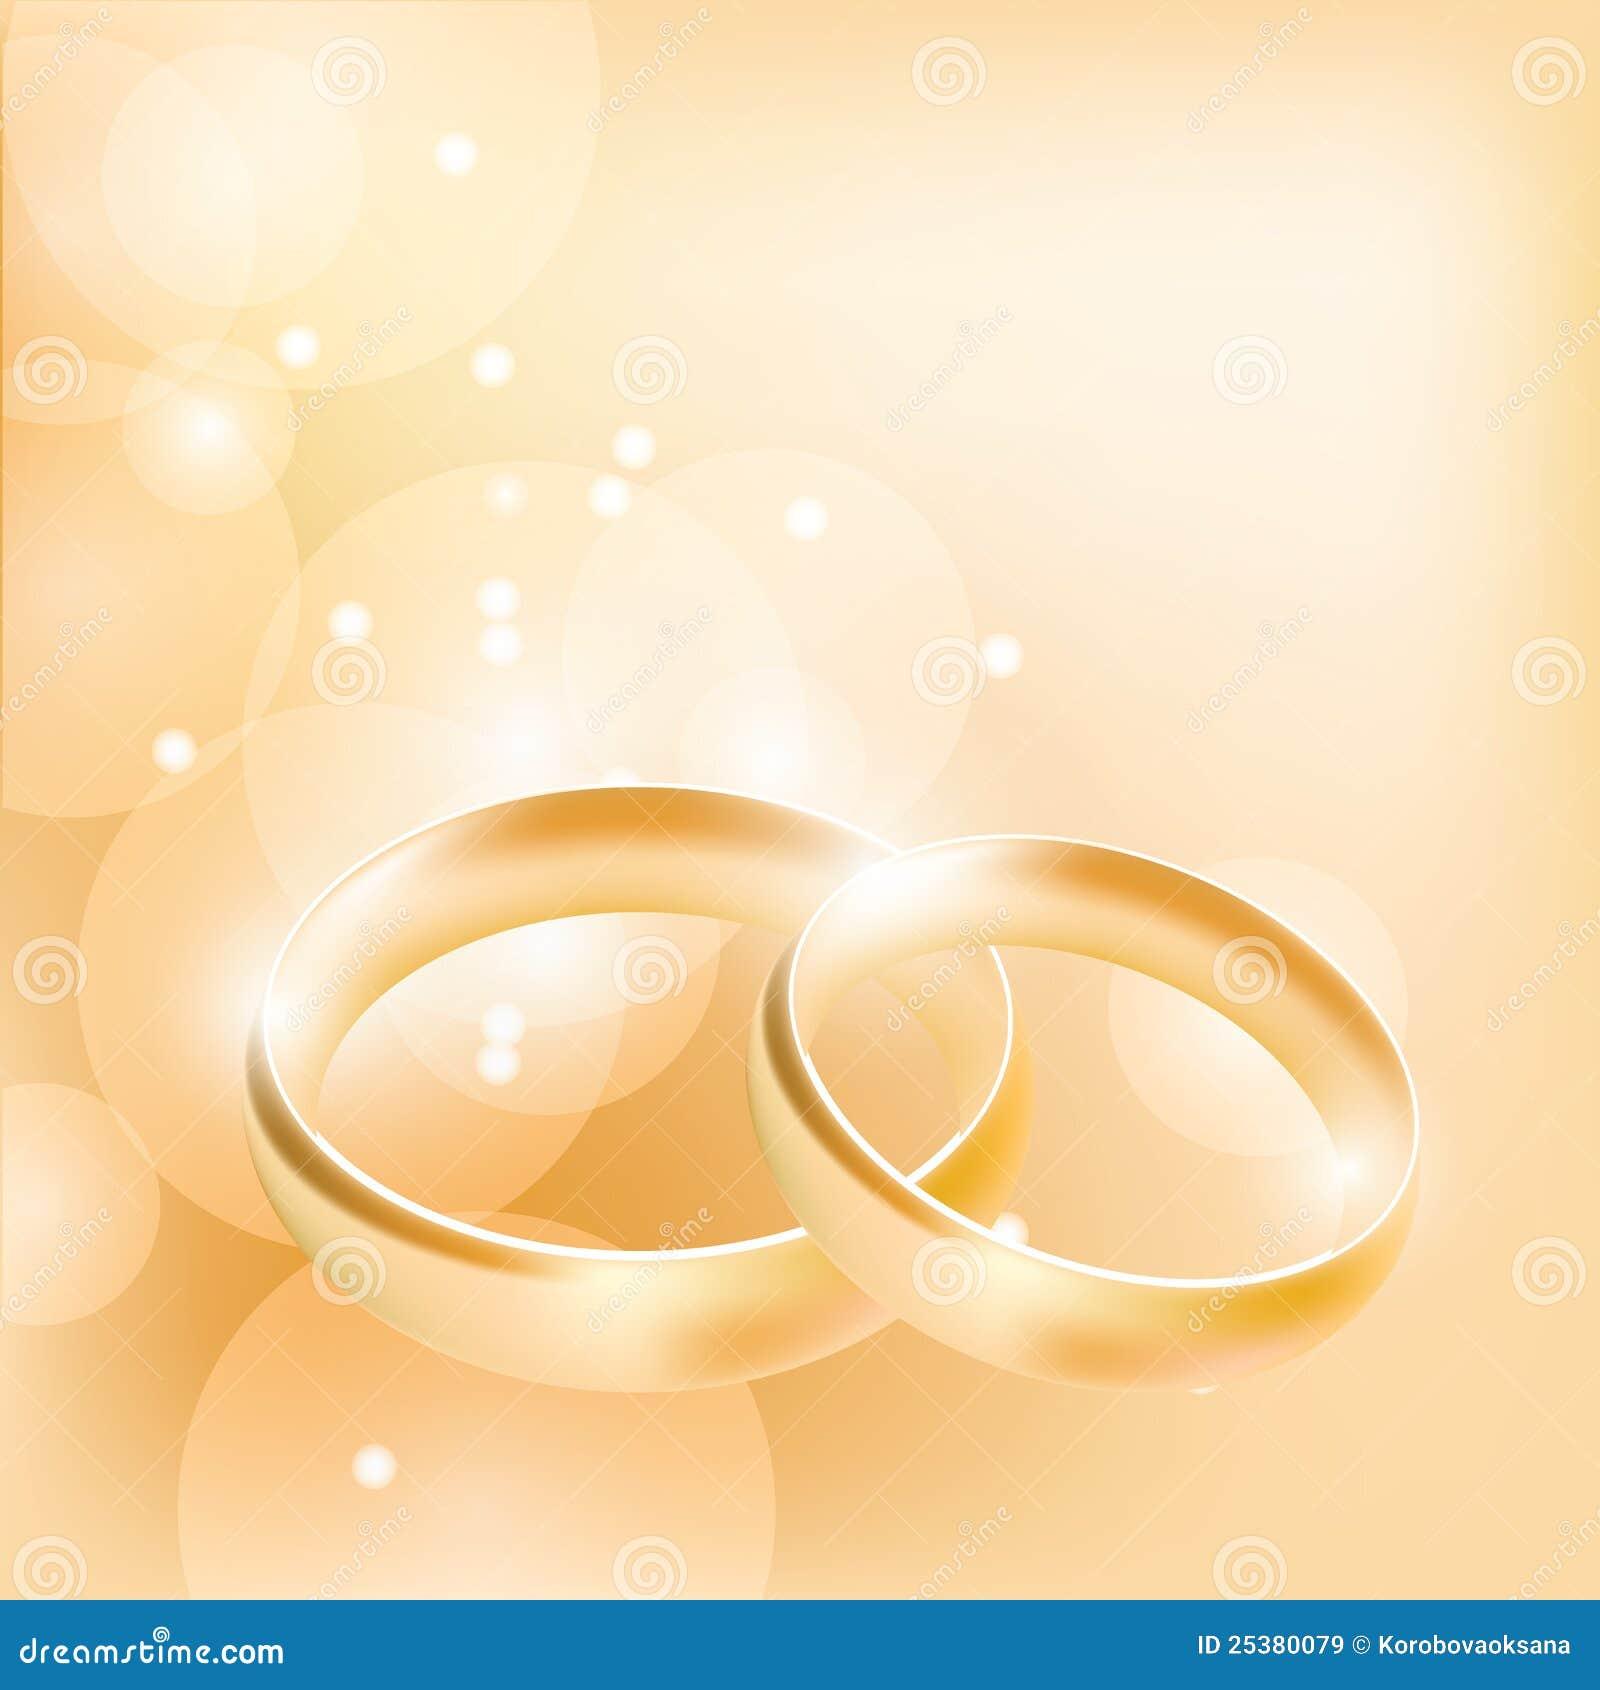 Wedding Invitation Backgrounds Wedding Rings